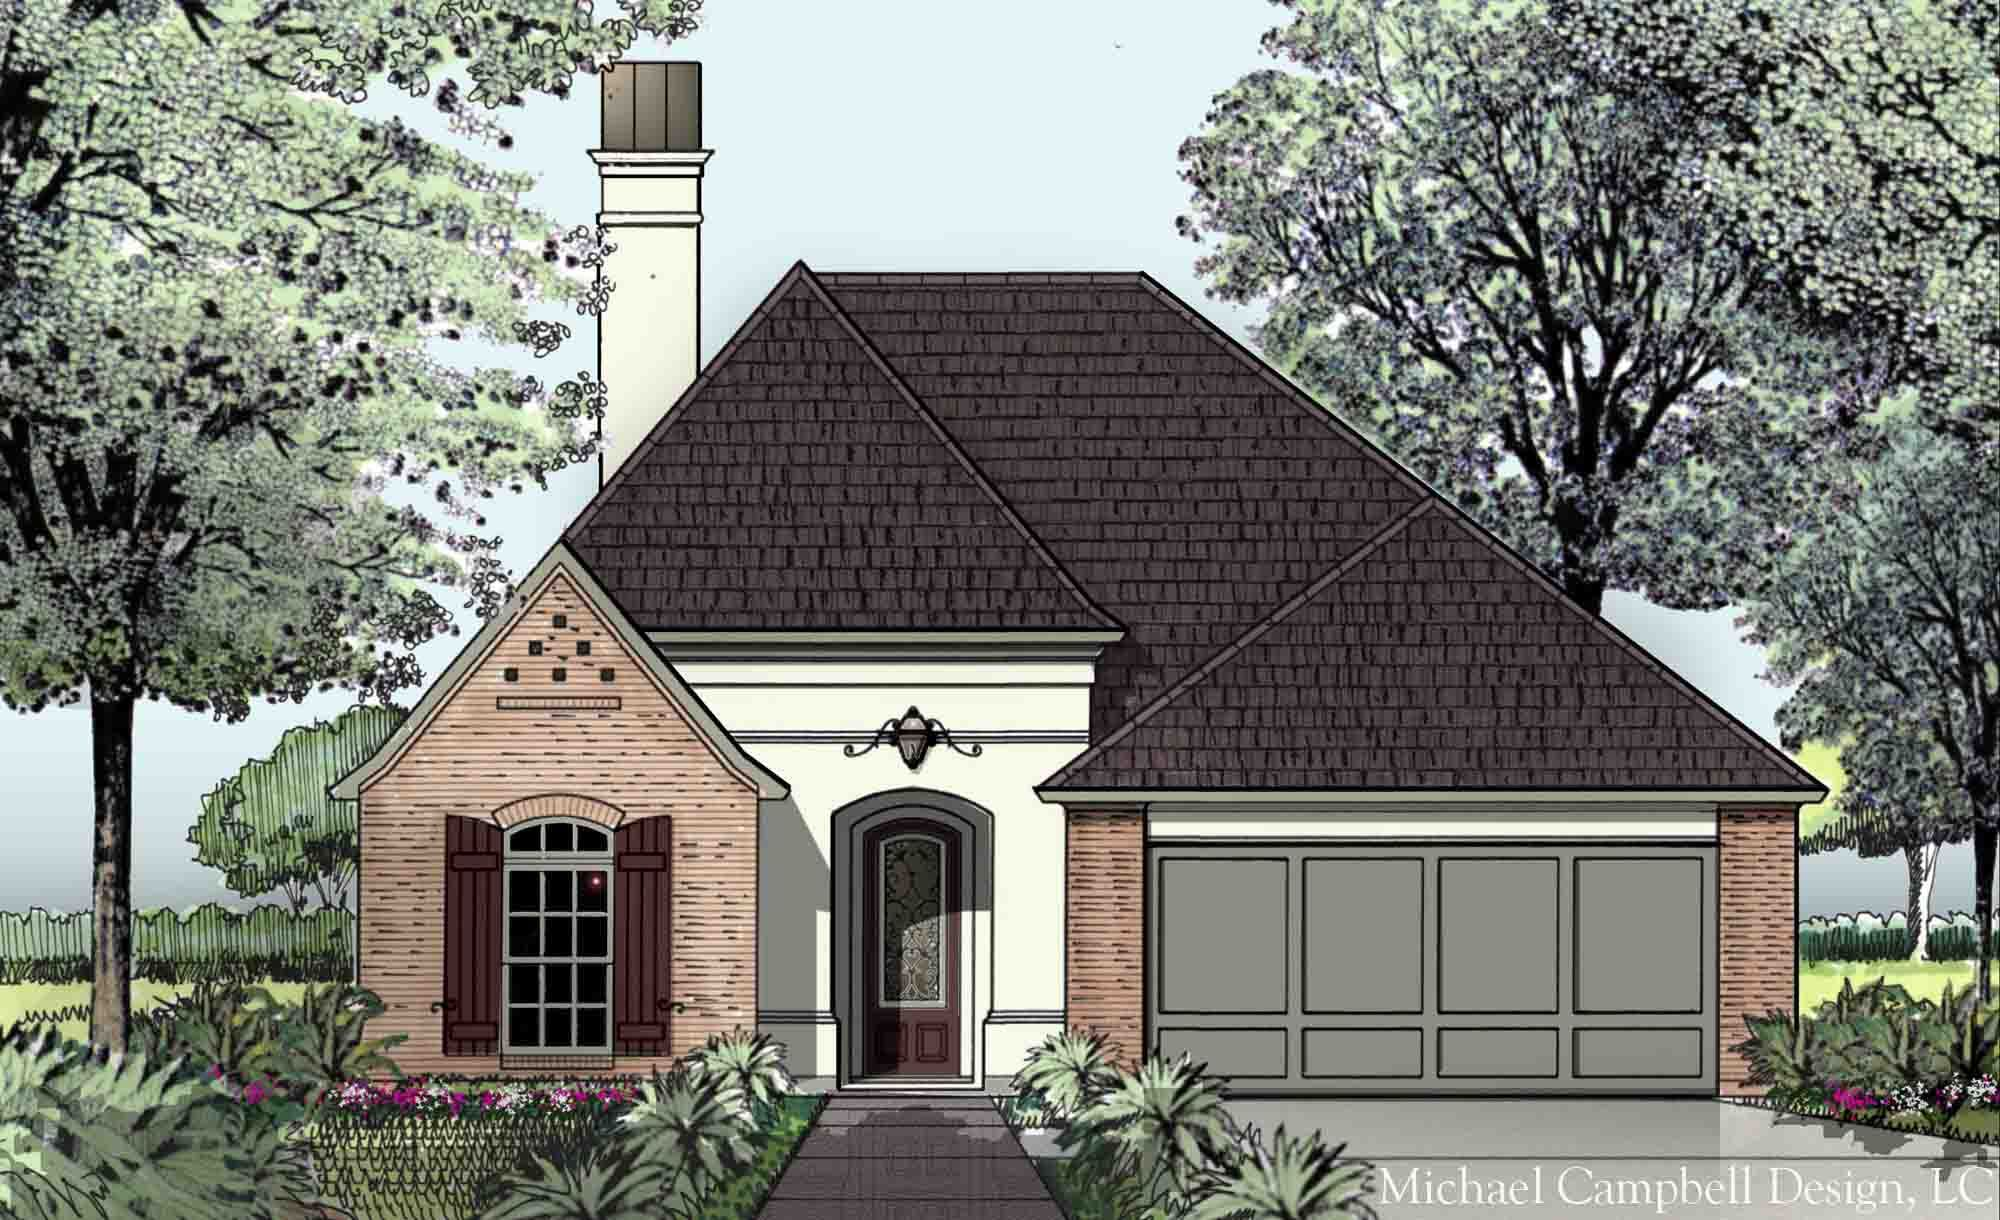 House Plans1 000 Sq Ft – Michael Campbell Design